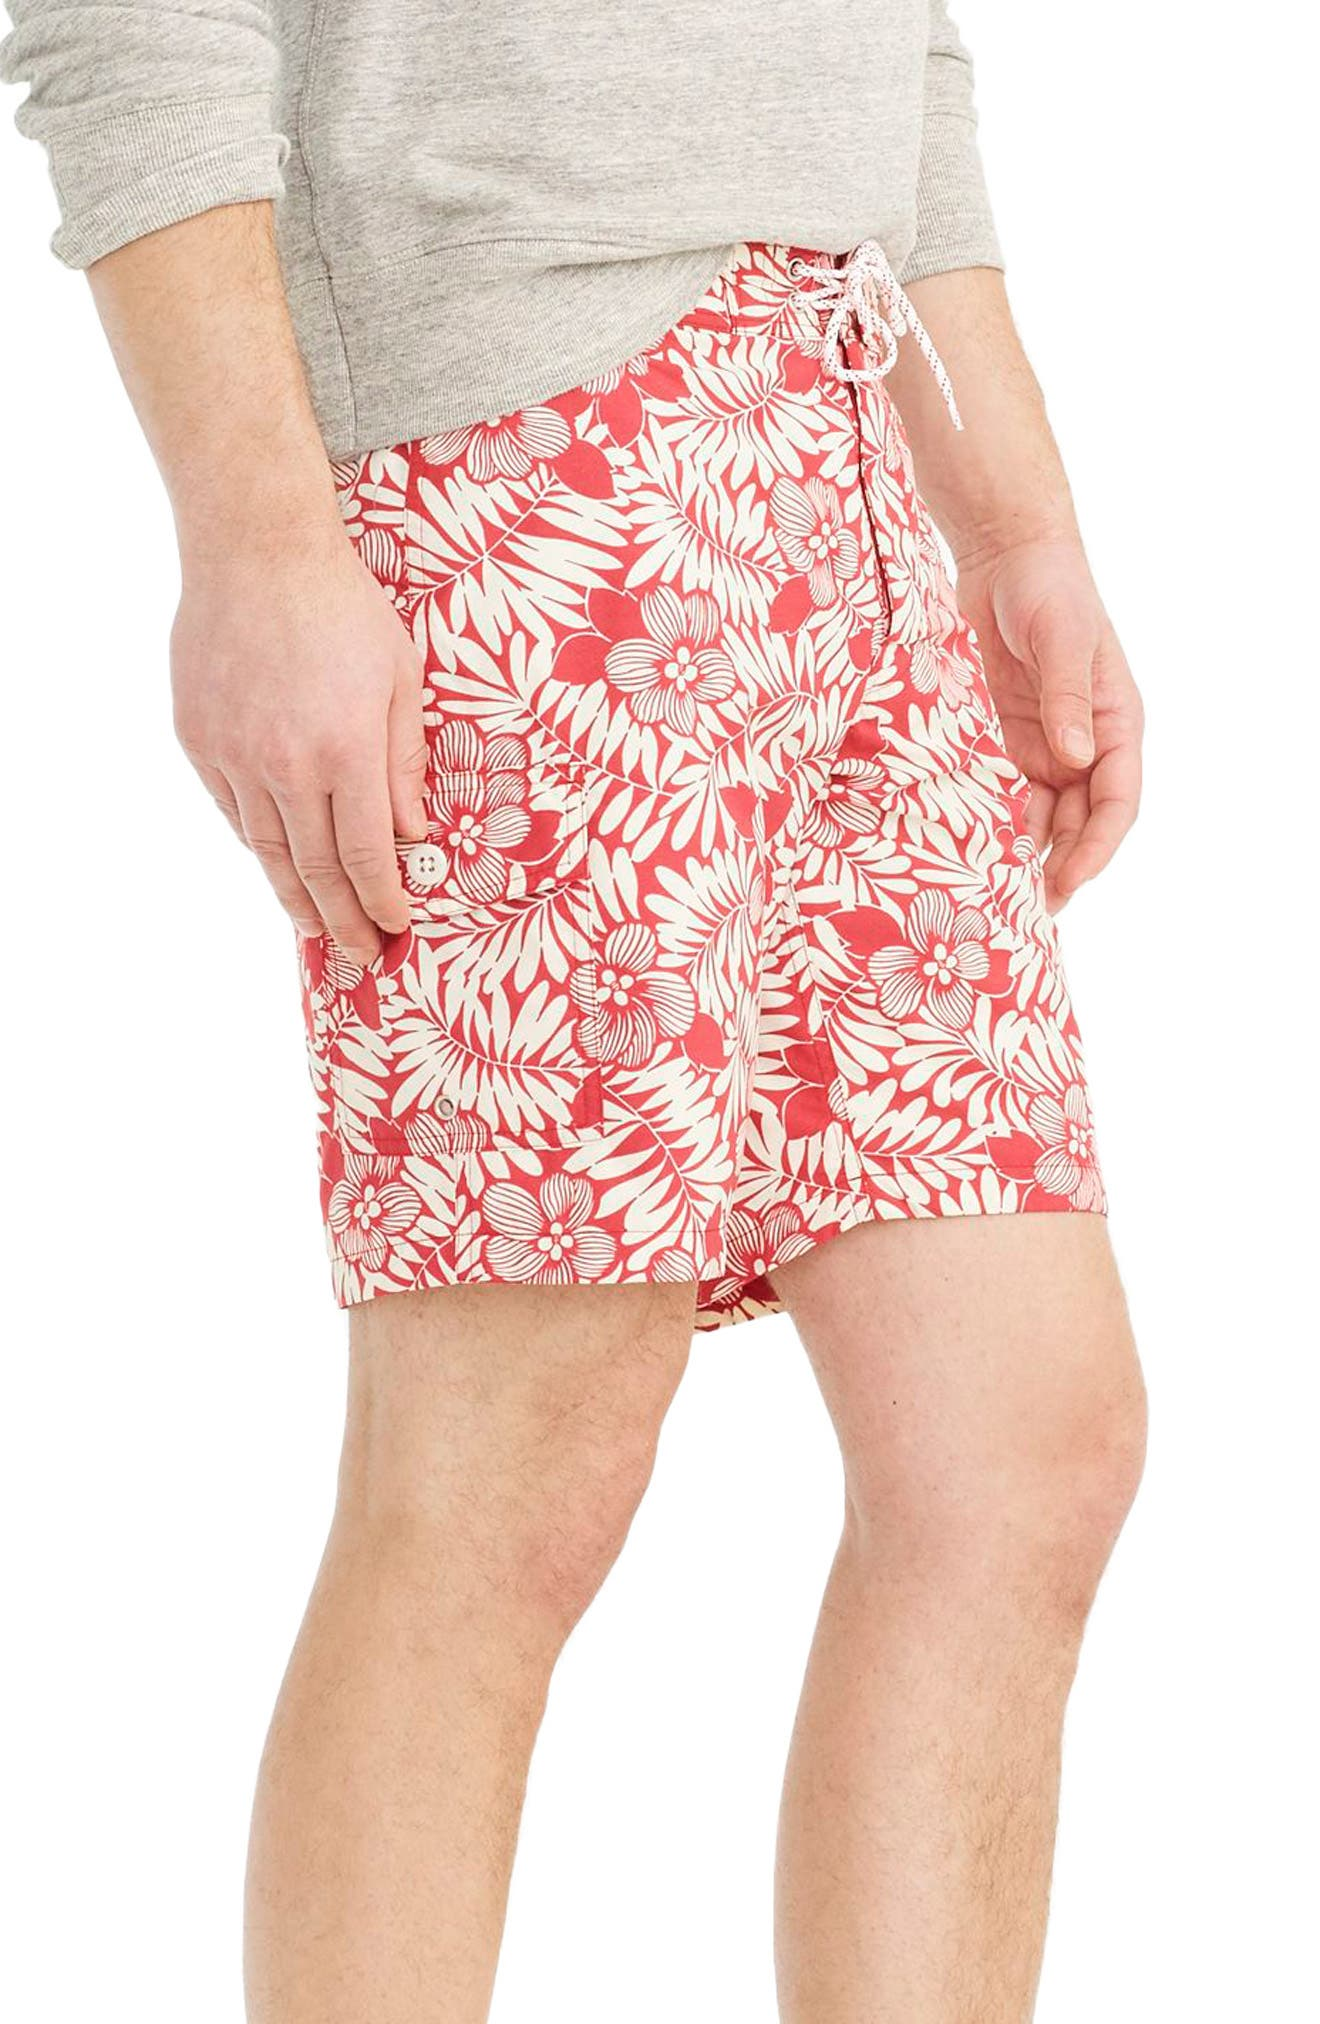 Fern Print Board Shorts,                             Alternate thumbnail 2, color,                             610